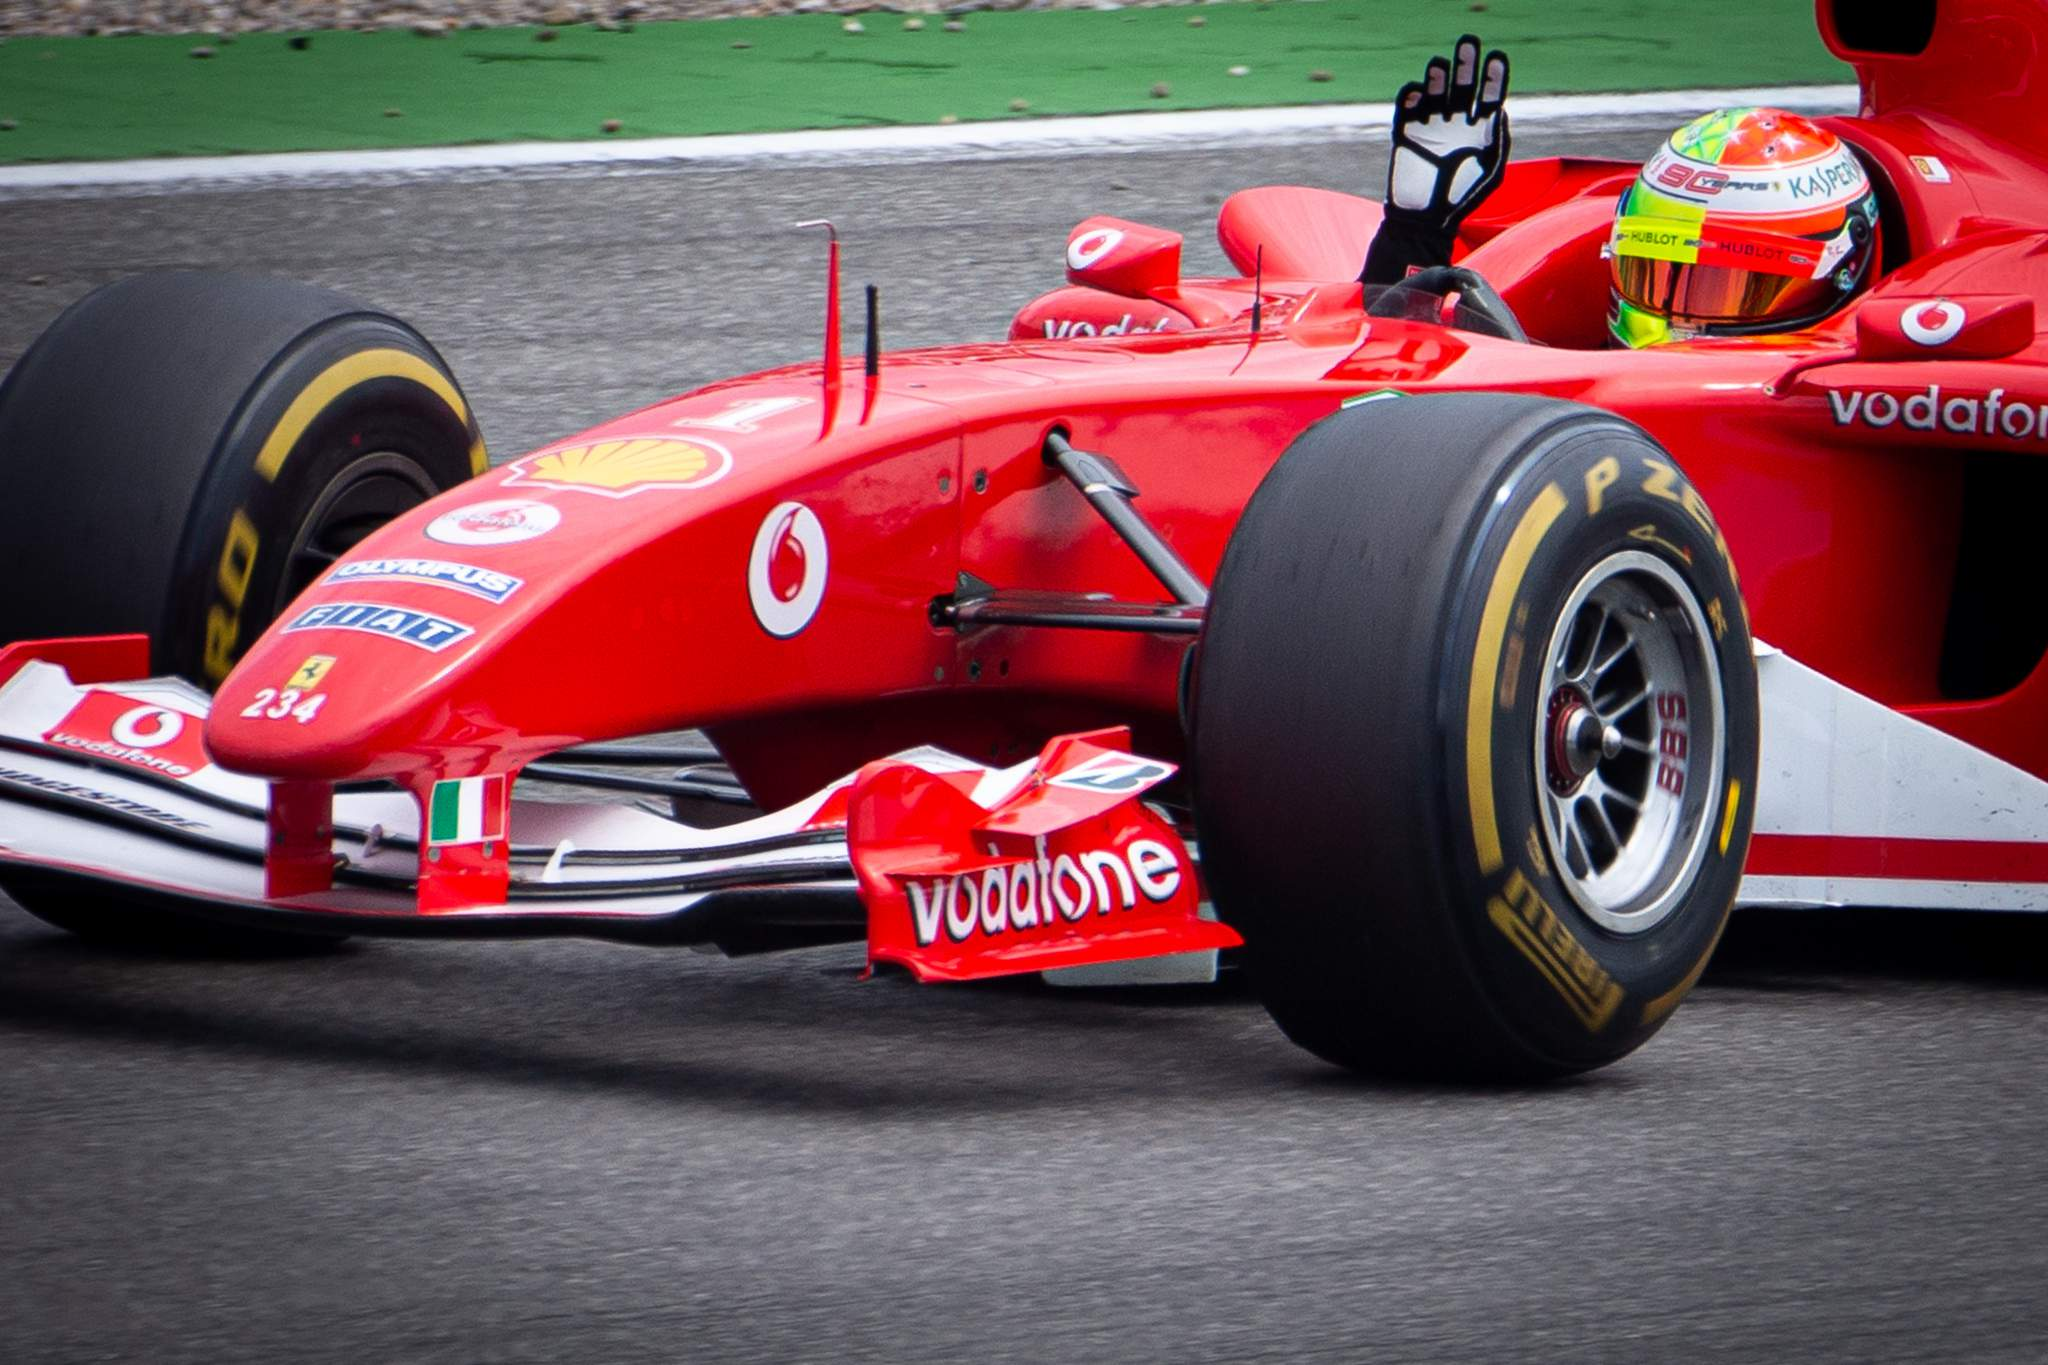 Motor Racing Formula One World Championship German Grand Prix Qualifying Day Hockenheim, Germany